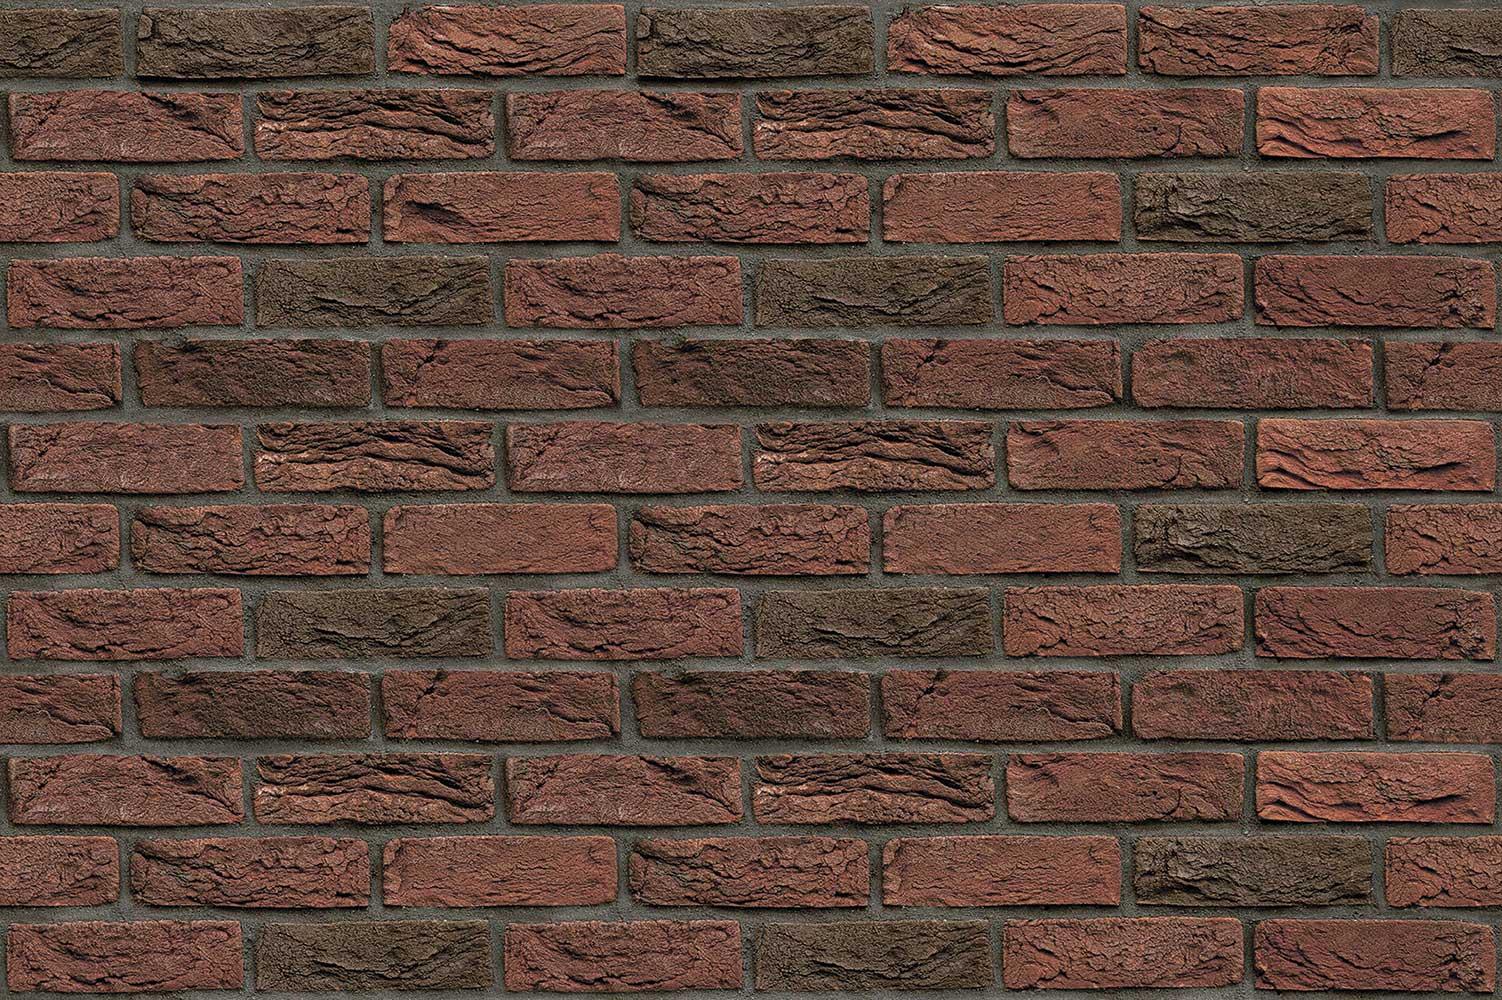 Плита ФАСПАН Красно-коричневый №1003 Горизонталь (1200х600х8мм)